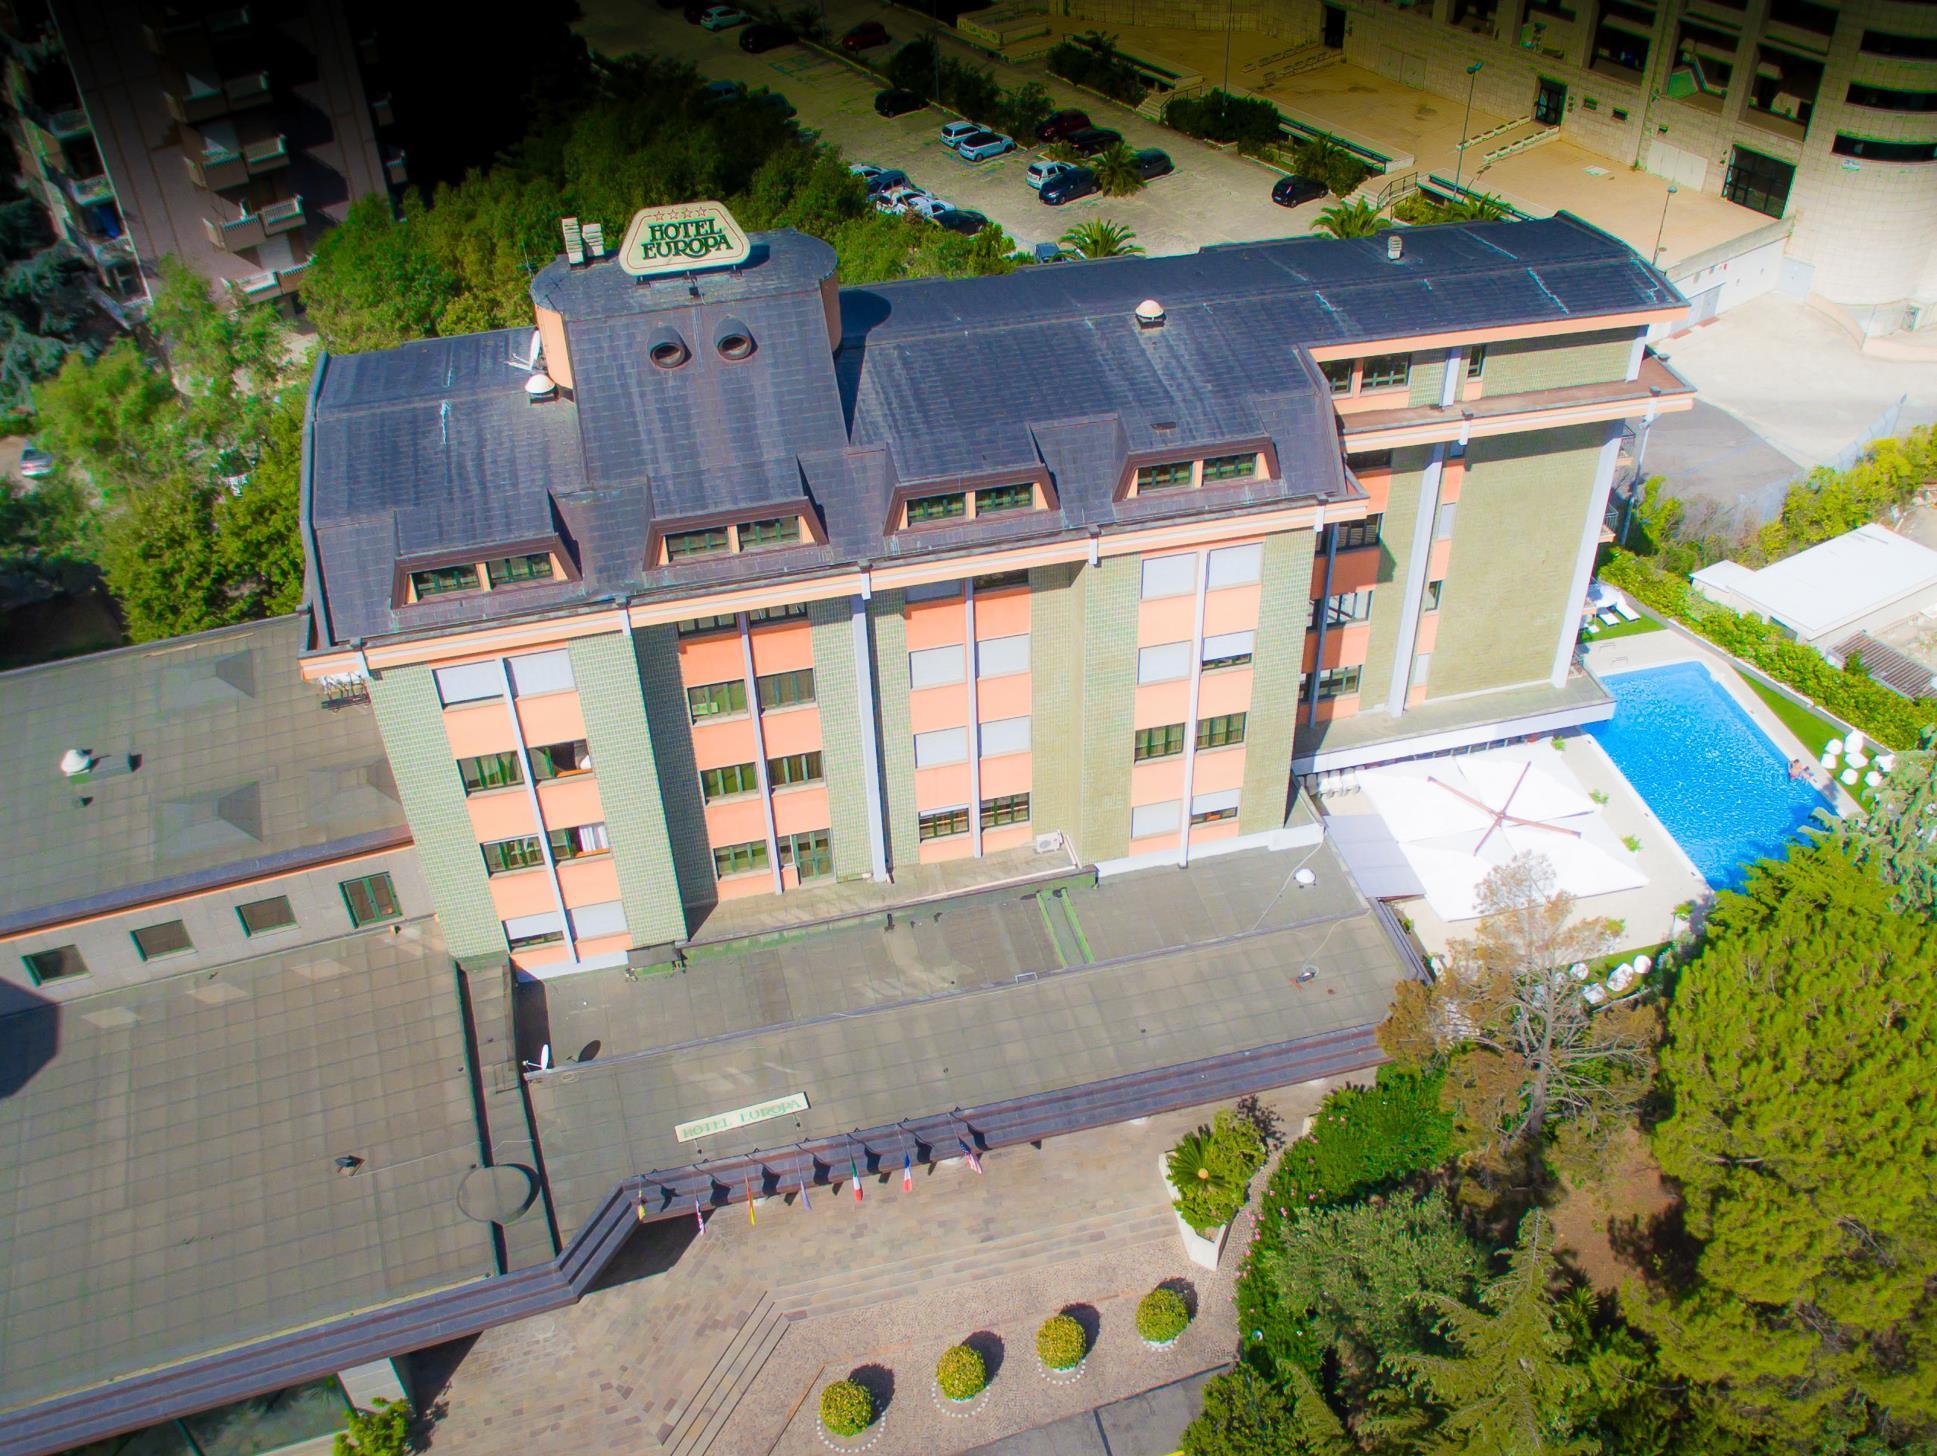 Rende Hotel Europa Cosenza In Italy Europe